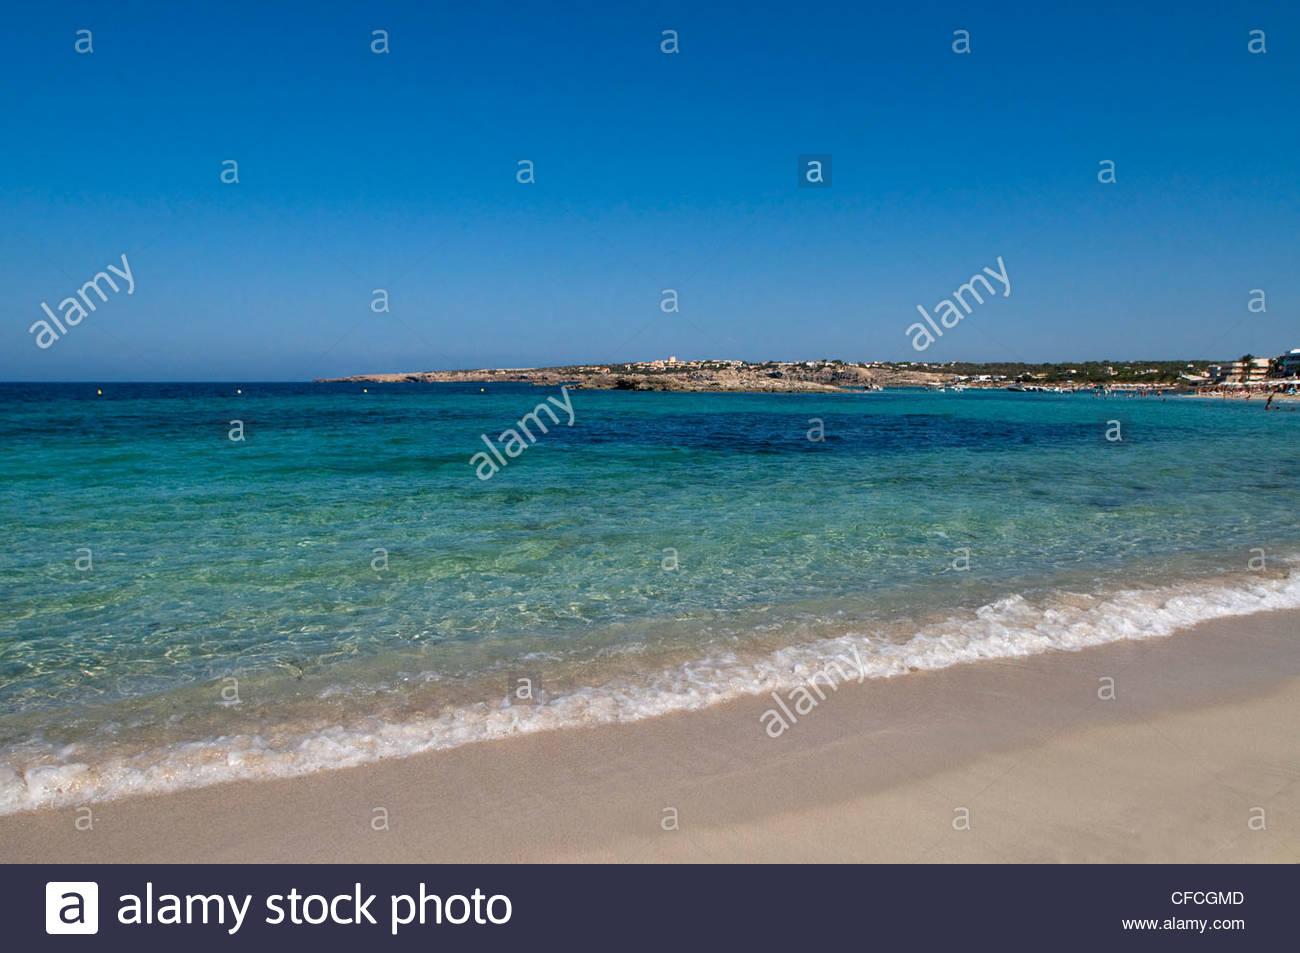 Beach Es Pujol Formentera Balearics Spain - Stock Image